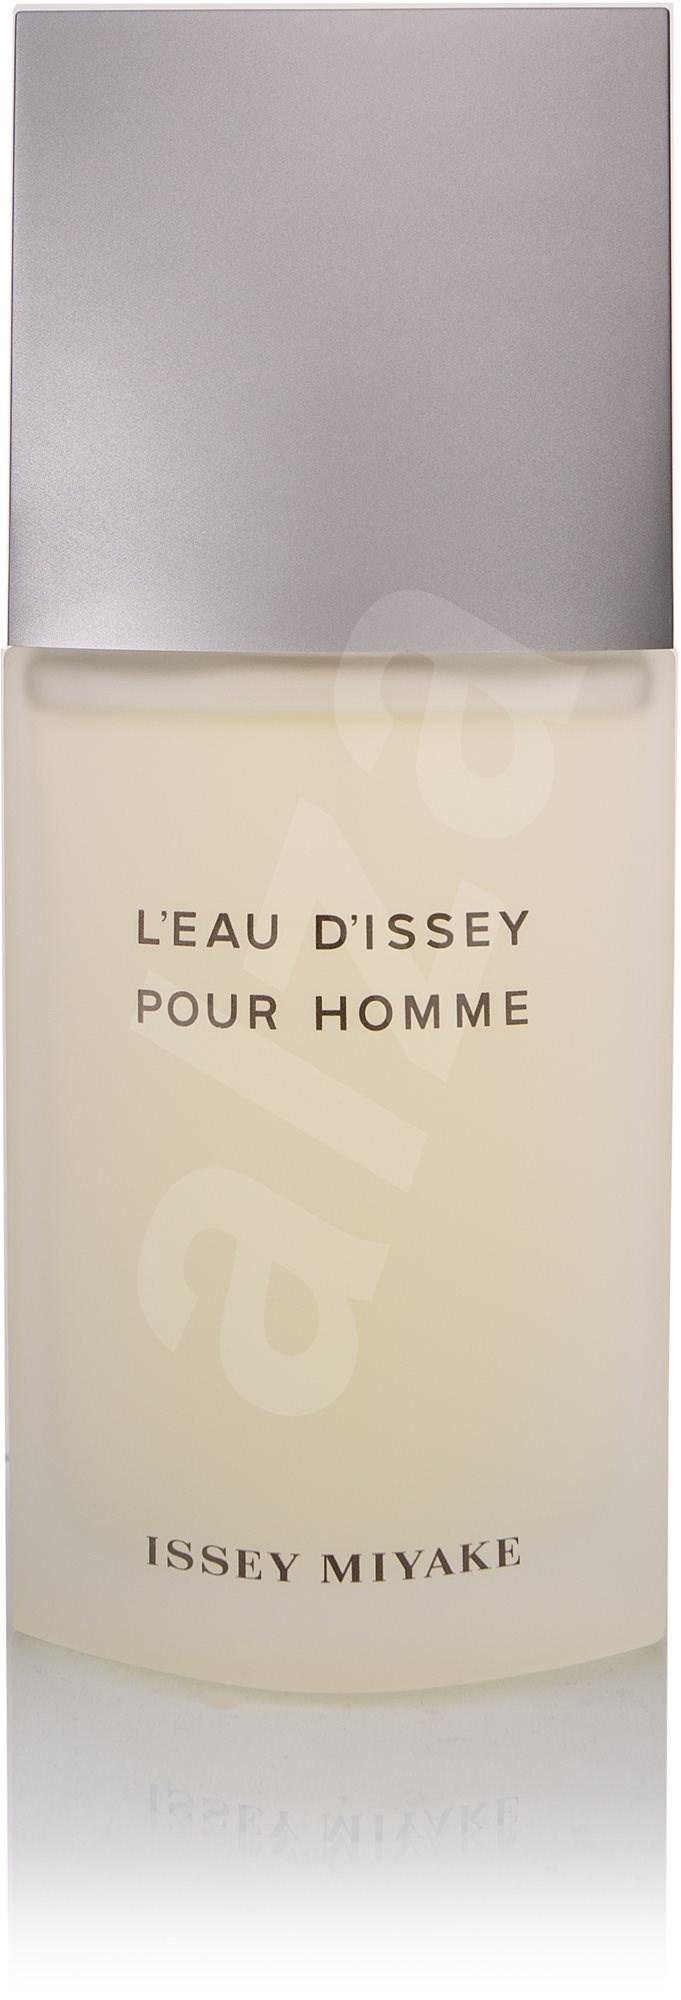 ISSEY MIYAKE L'Eau D'Issey Pour Homme EdT 125 ml - Férfi toalettvíz